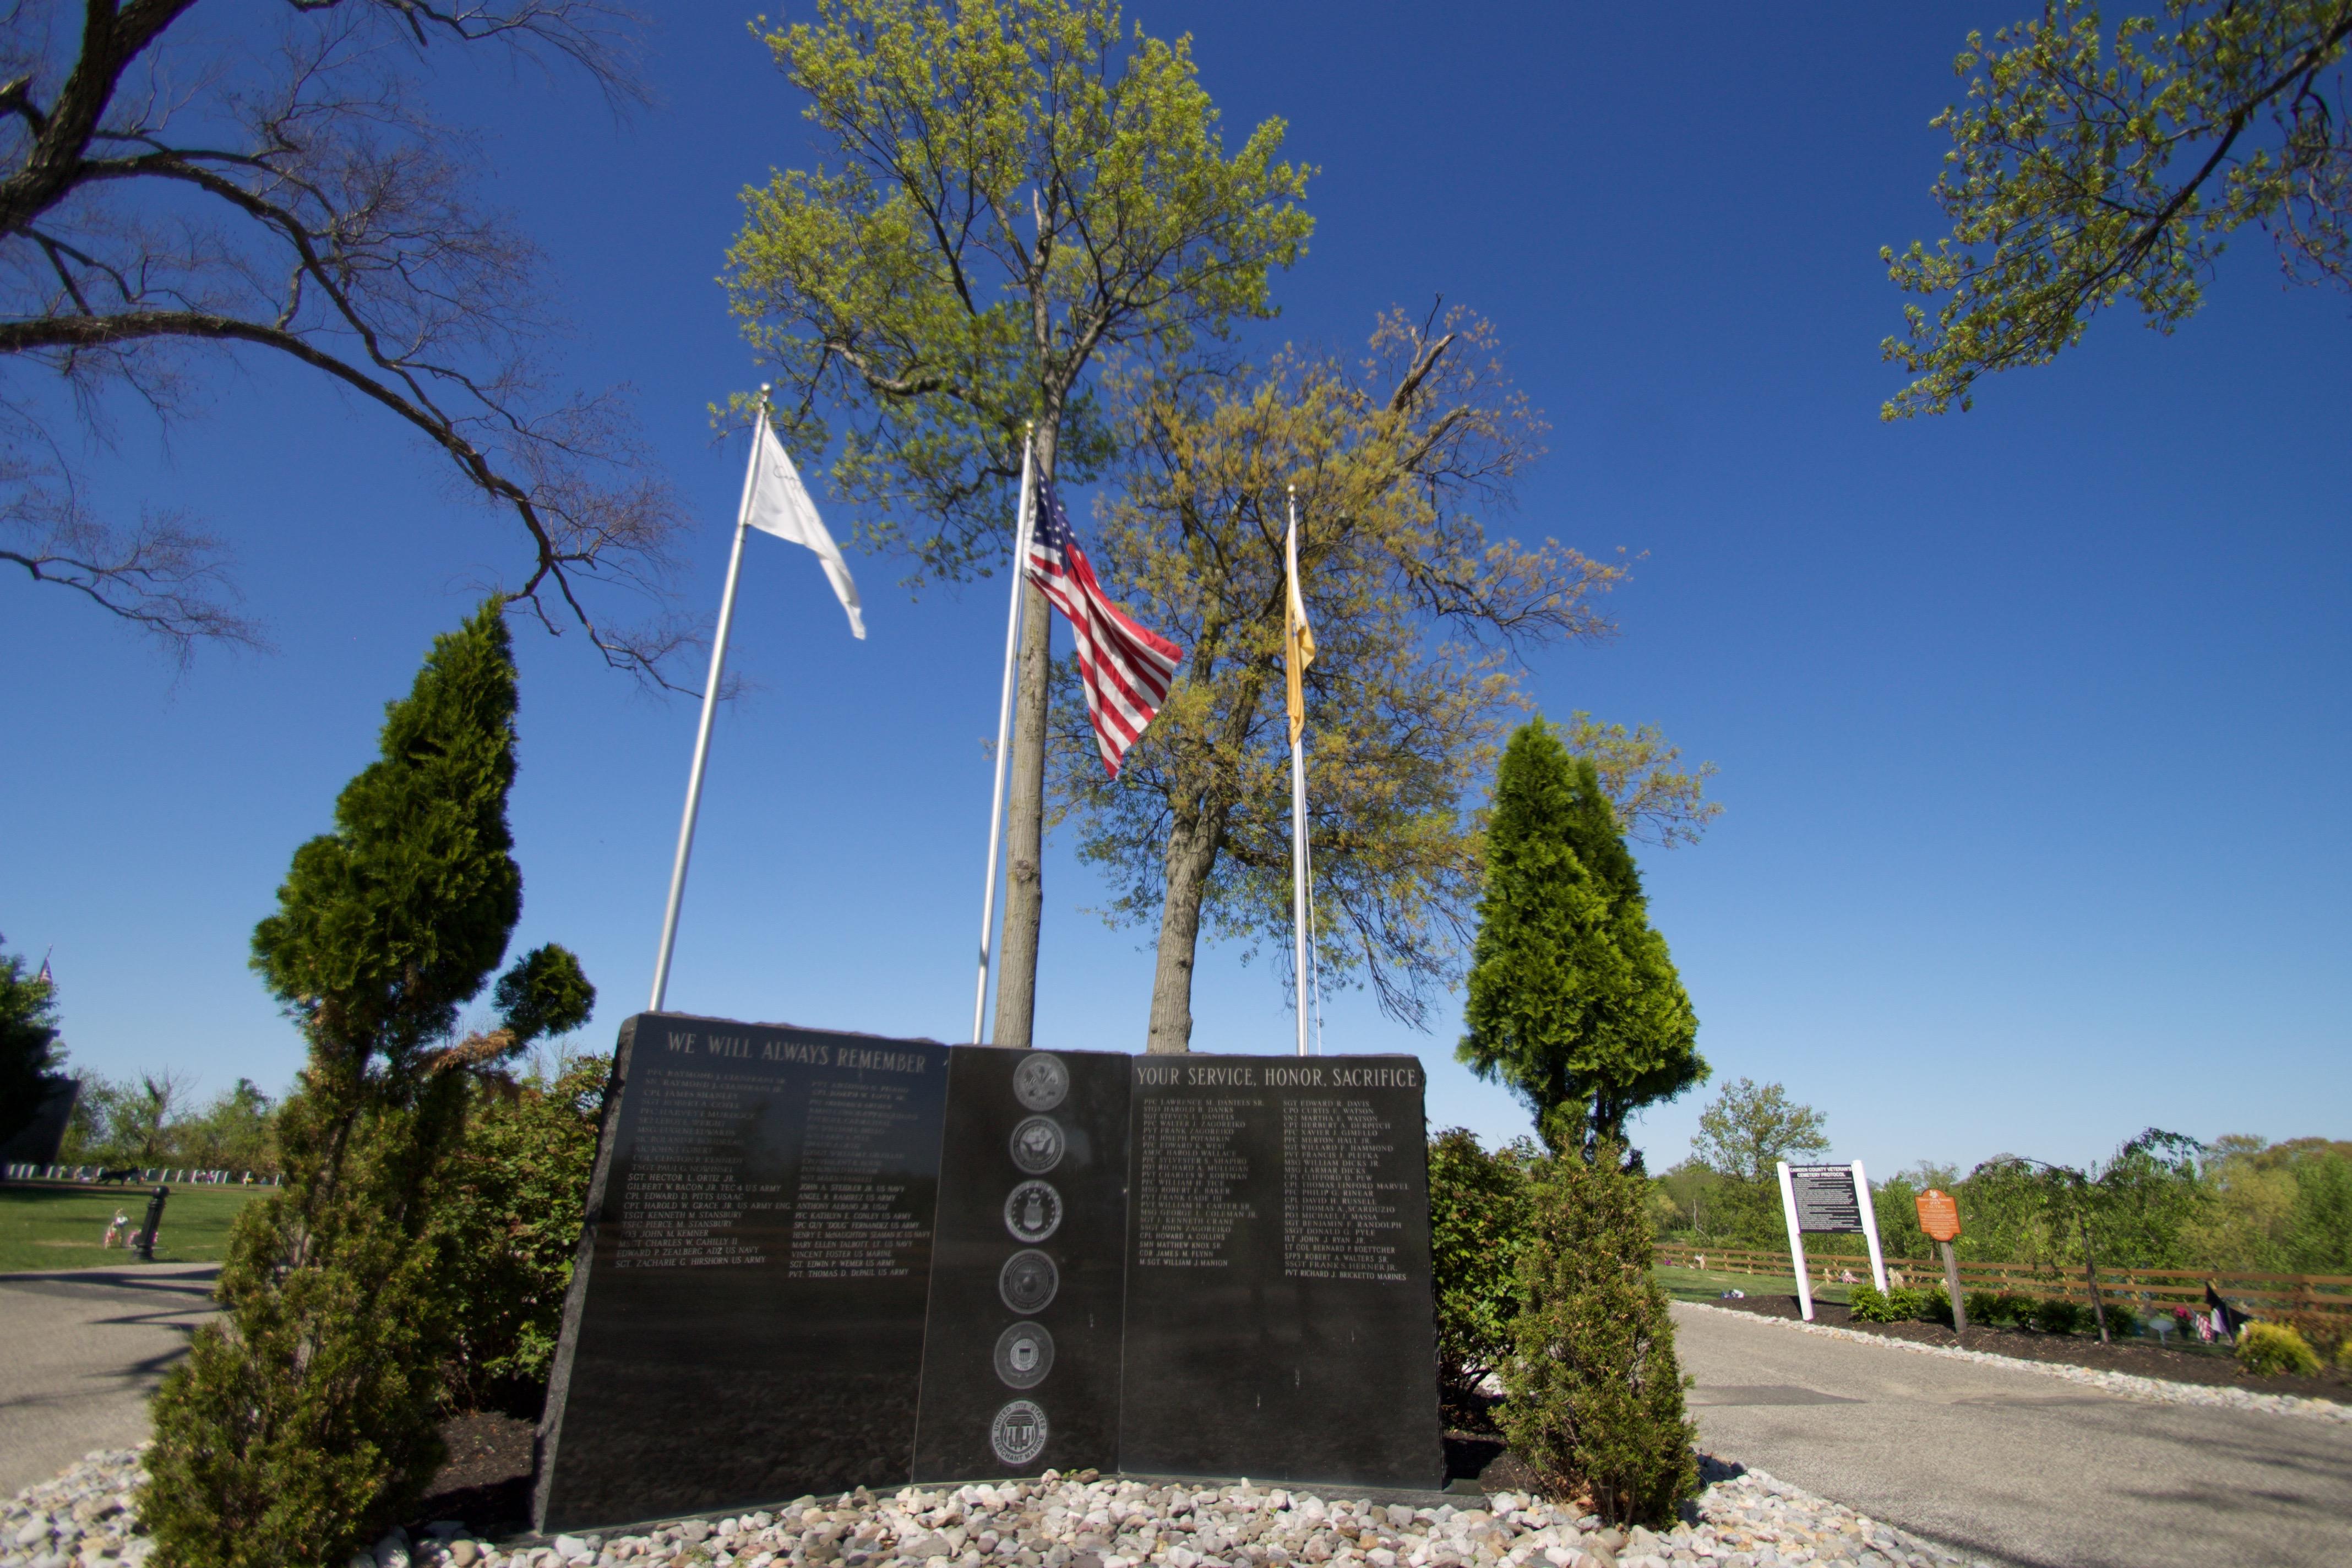 Camden County Veterans Cemetery image 7